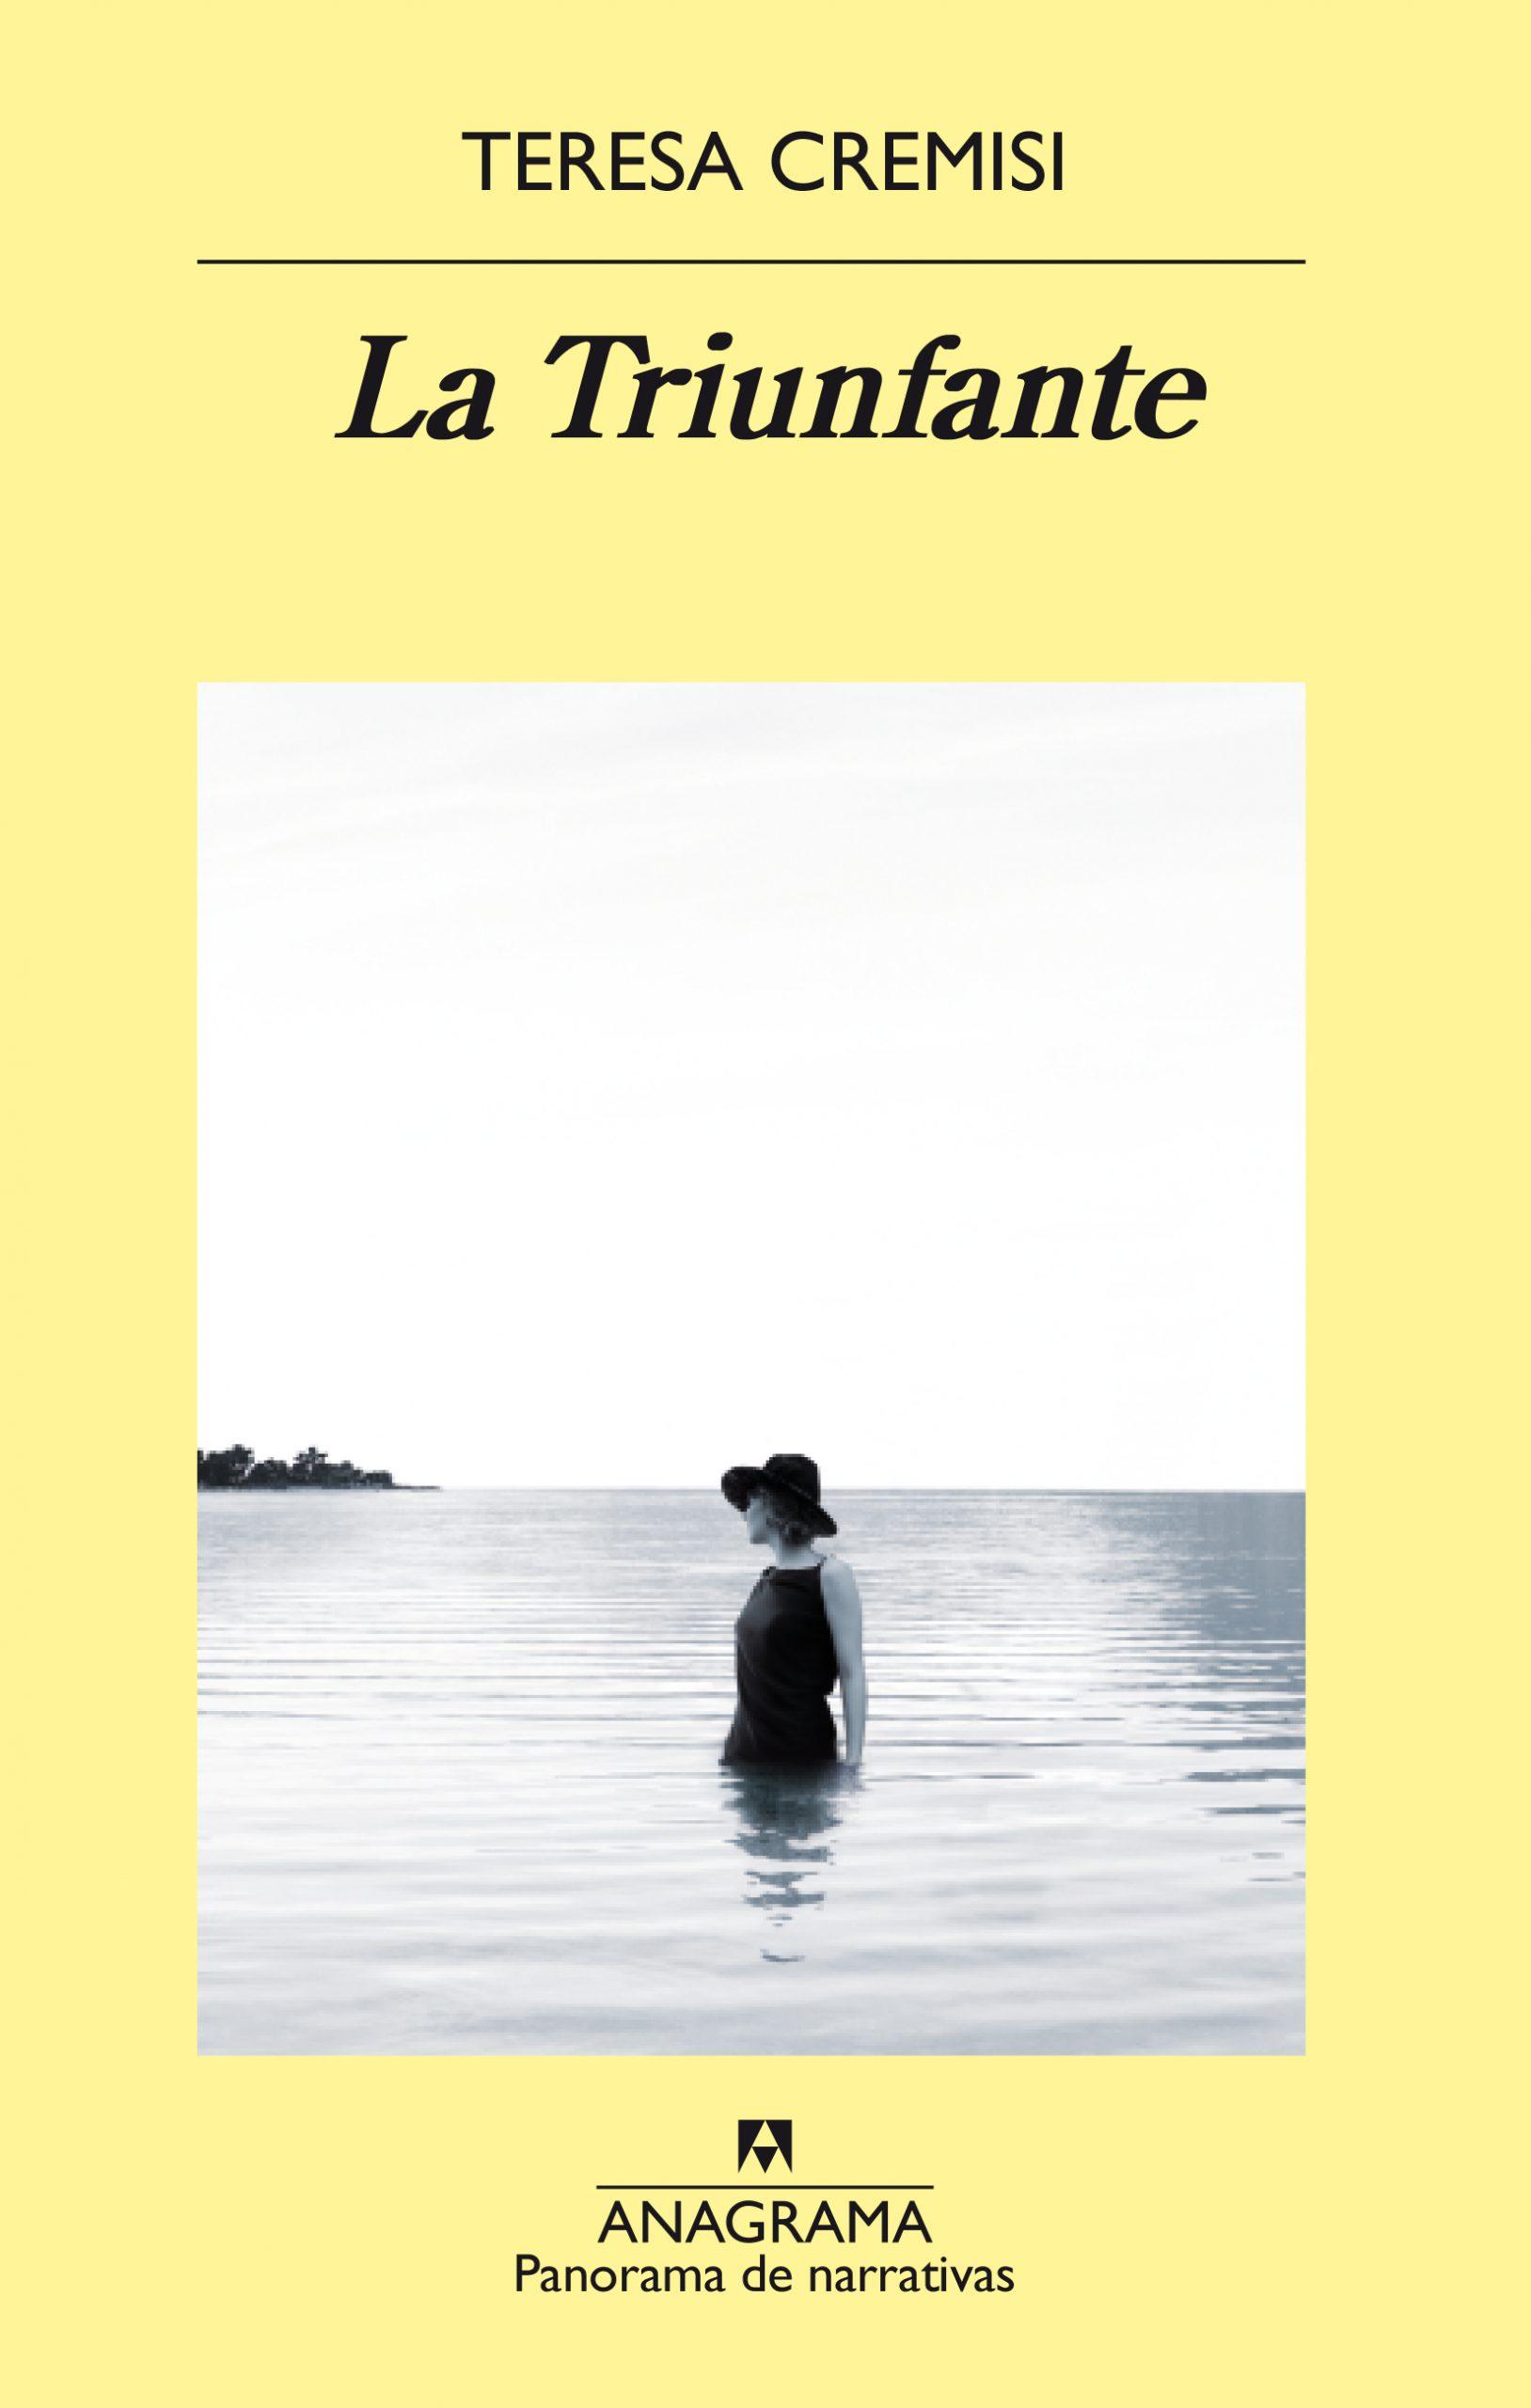 'La triunfante' de Teresa Cremisi